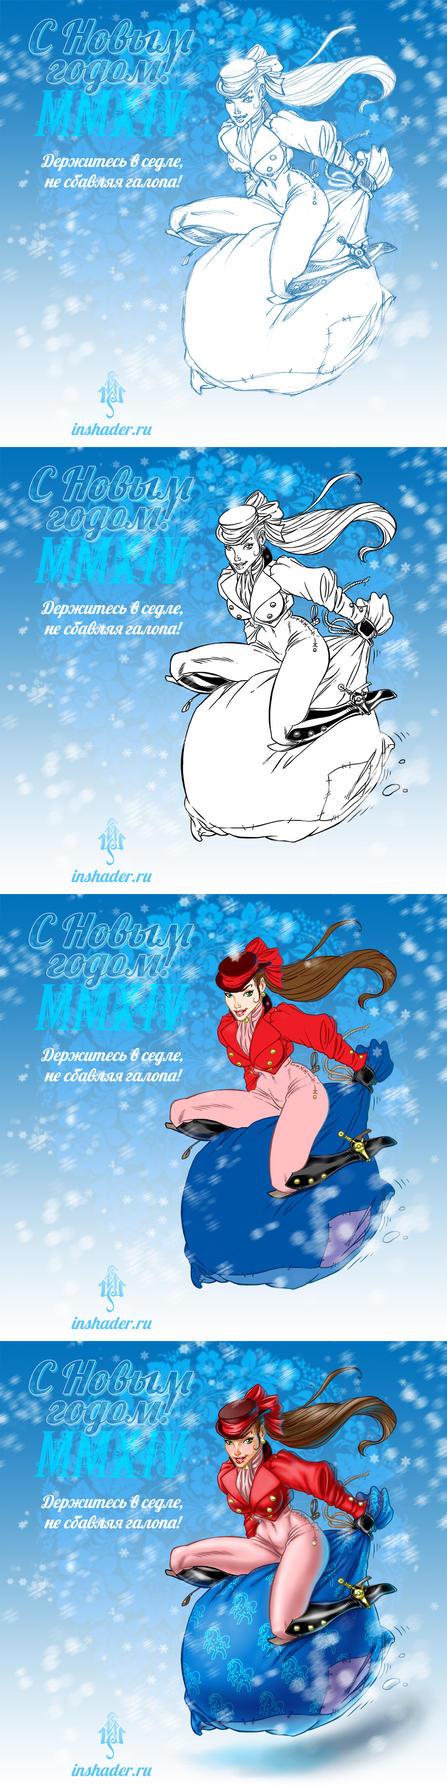 Happy New Year 2014 by Inshader